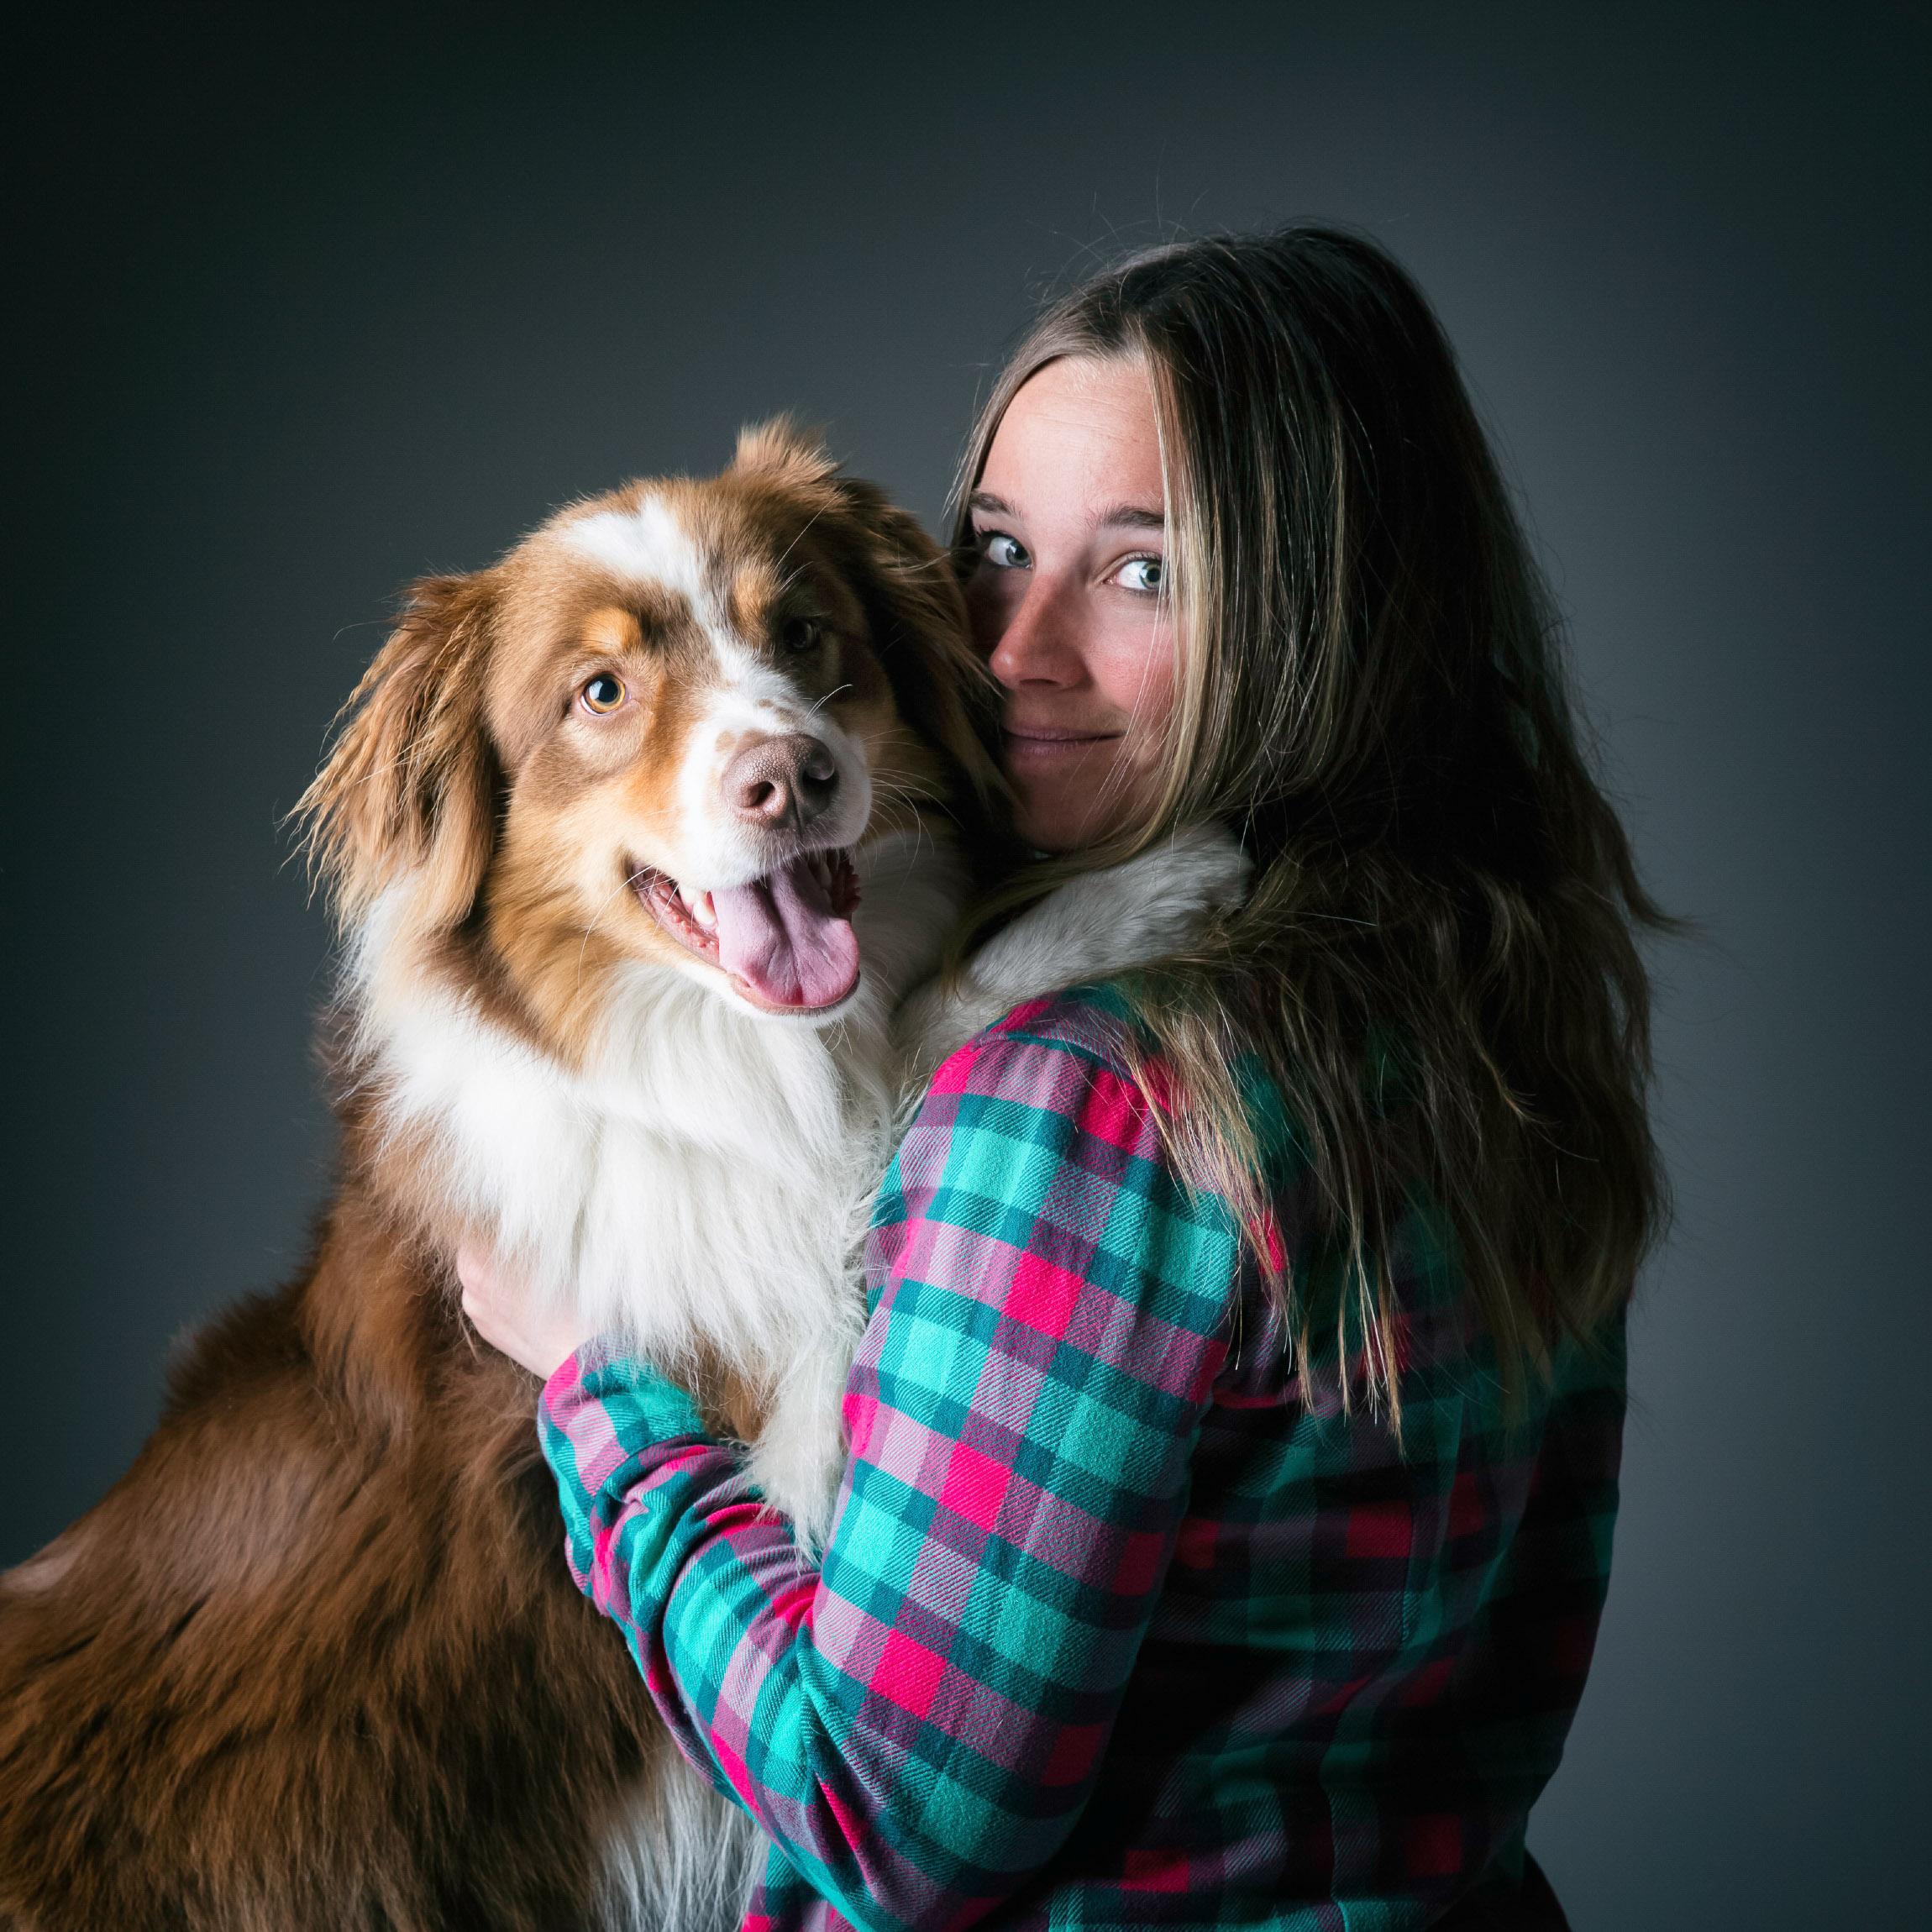 06 foto-gossos-celine-pech-andorra-0133